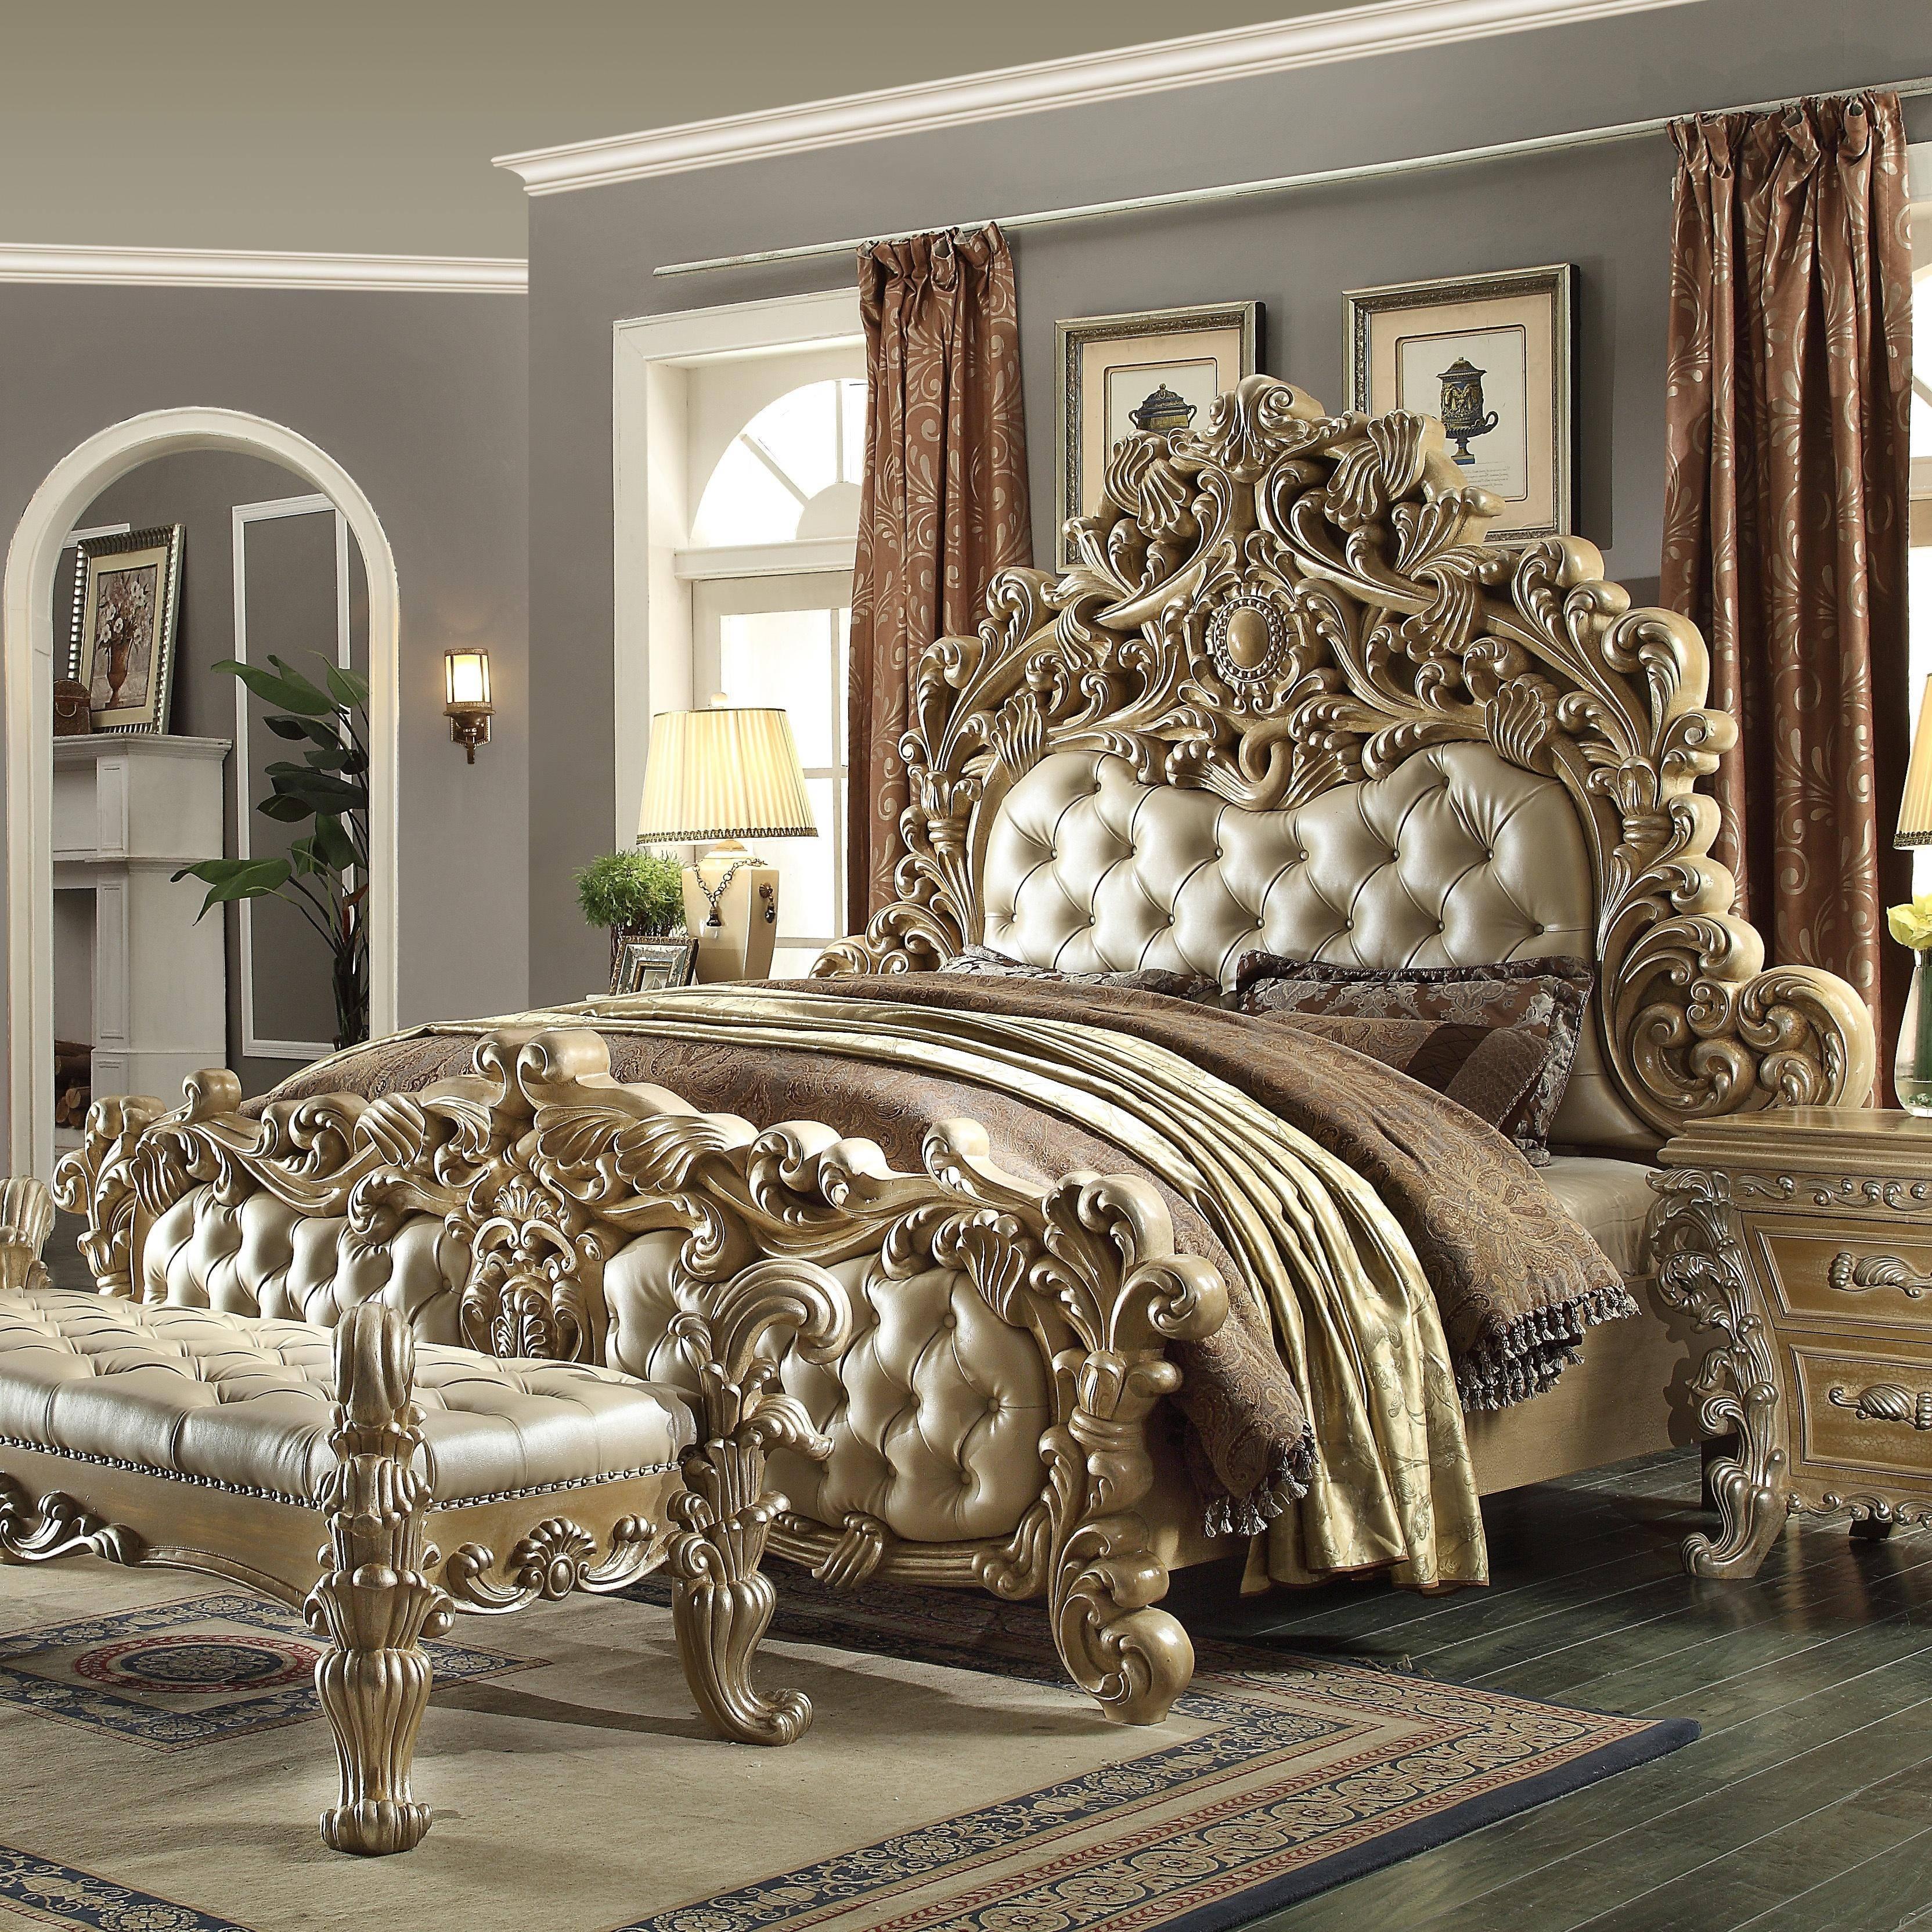 royal bedroom sets - HD1495×1169